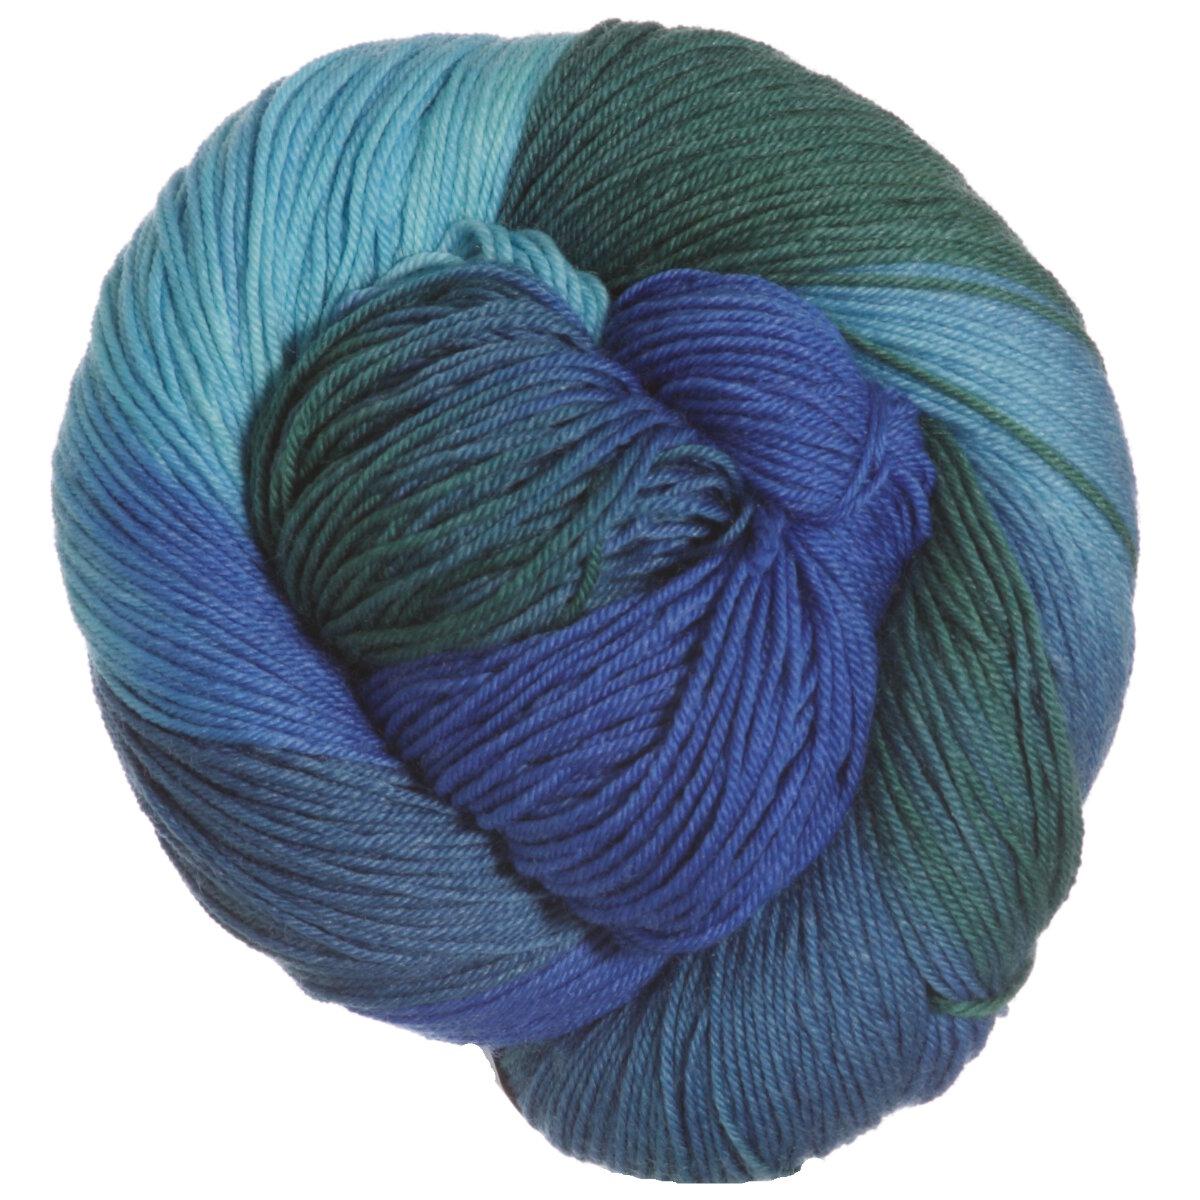 Shepherd Knitting Patterns Free : Lornas Laces Shepherd Sock Yarn - Icehouse at Jimmy Beans Wool